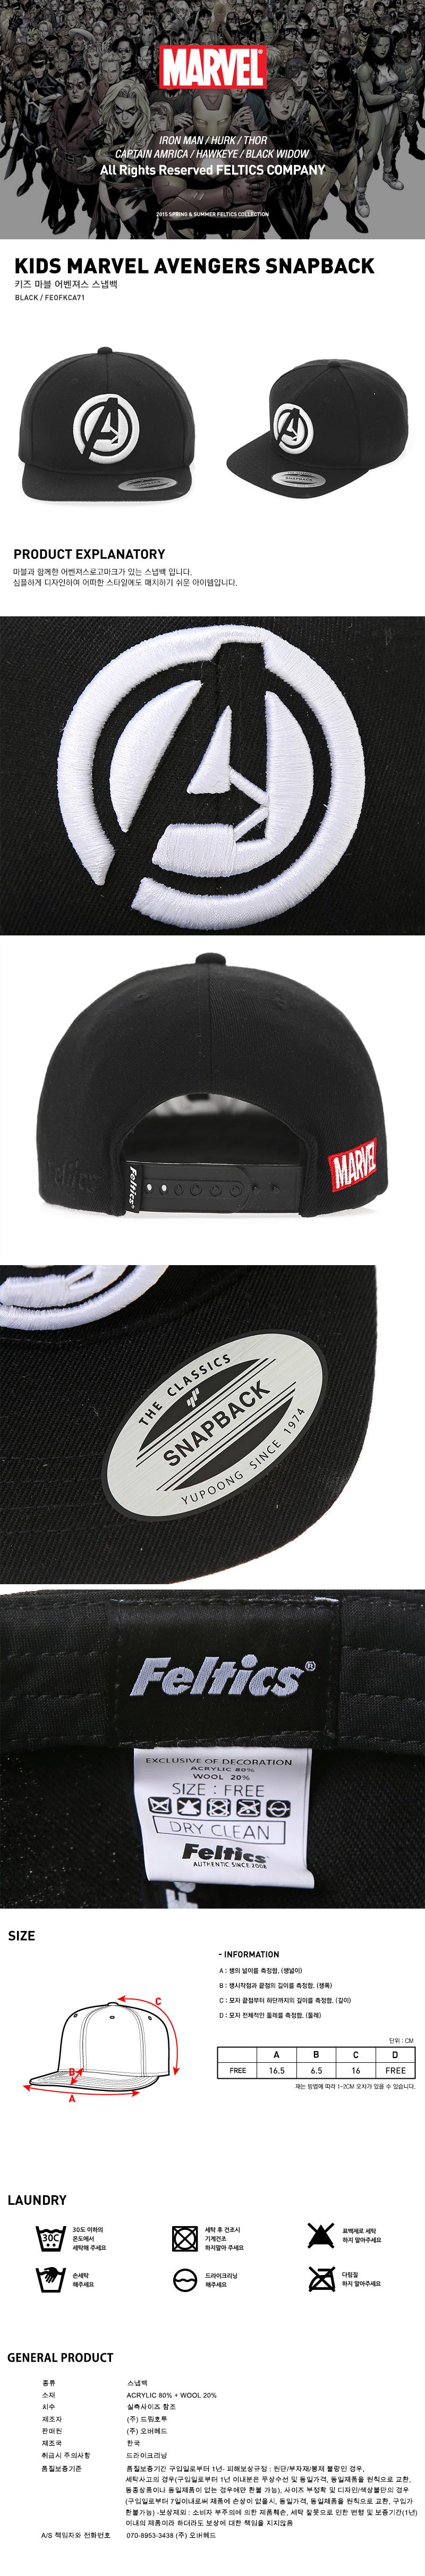 [ FELTICS ] [FELTICS] Kids Marvel Avengers SnapBack BK (FEOFKCA71)